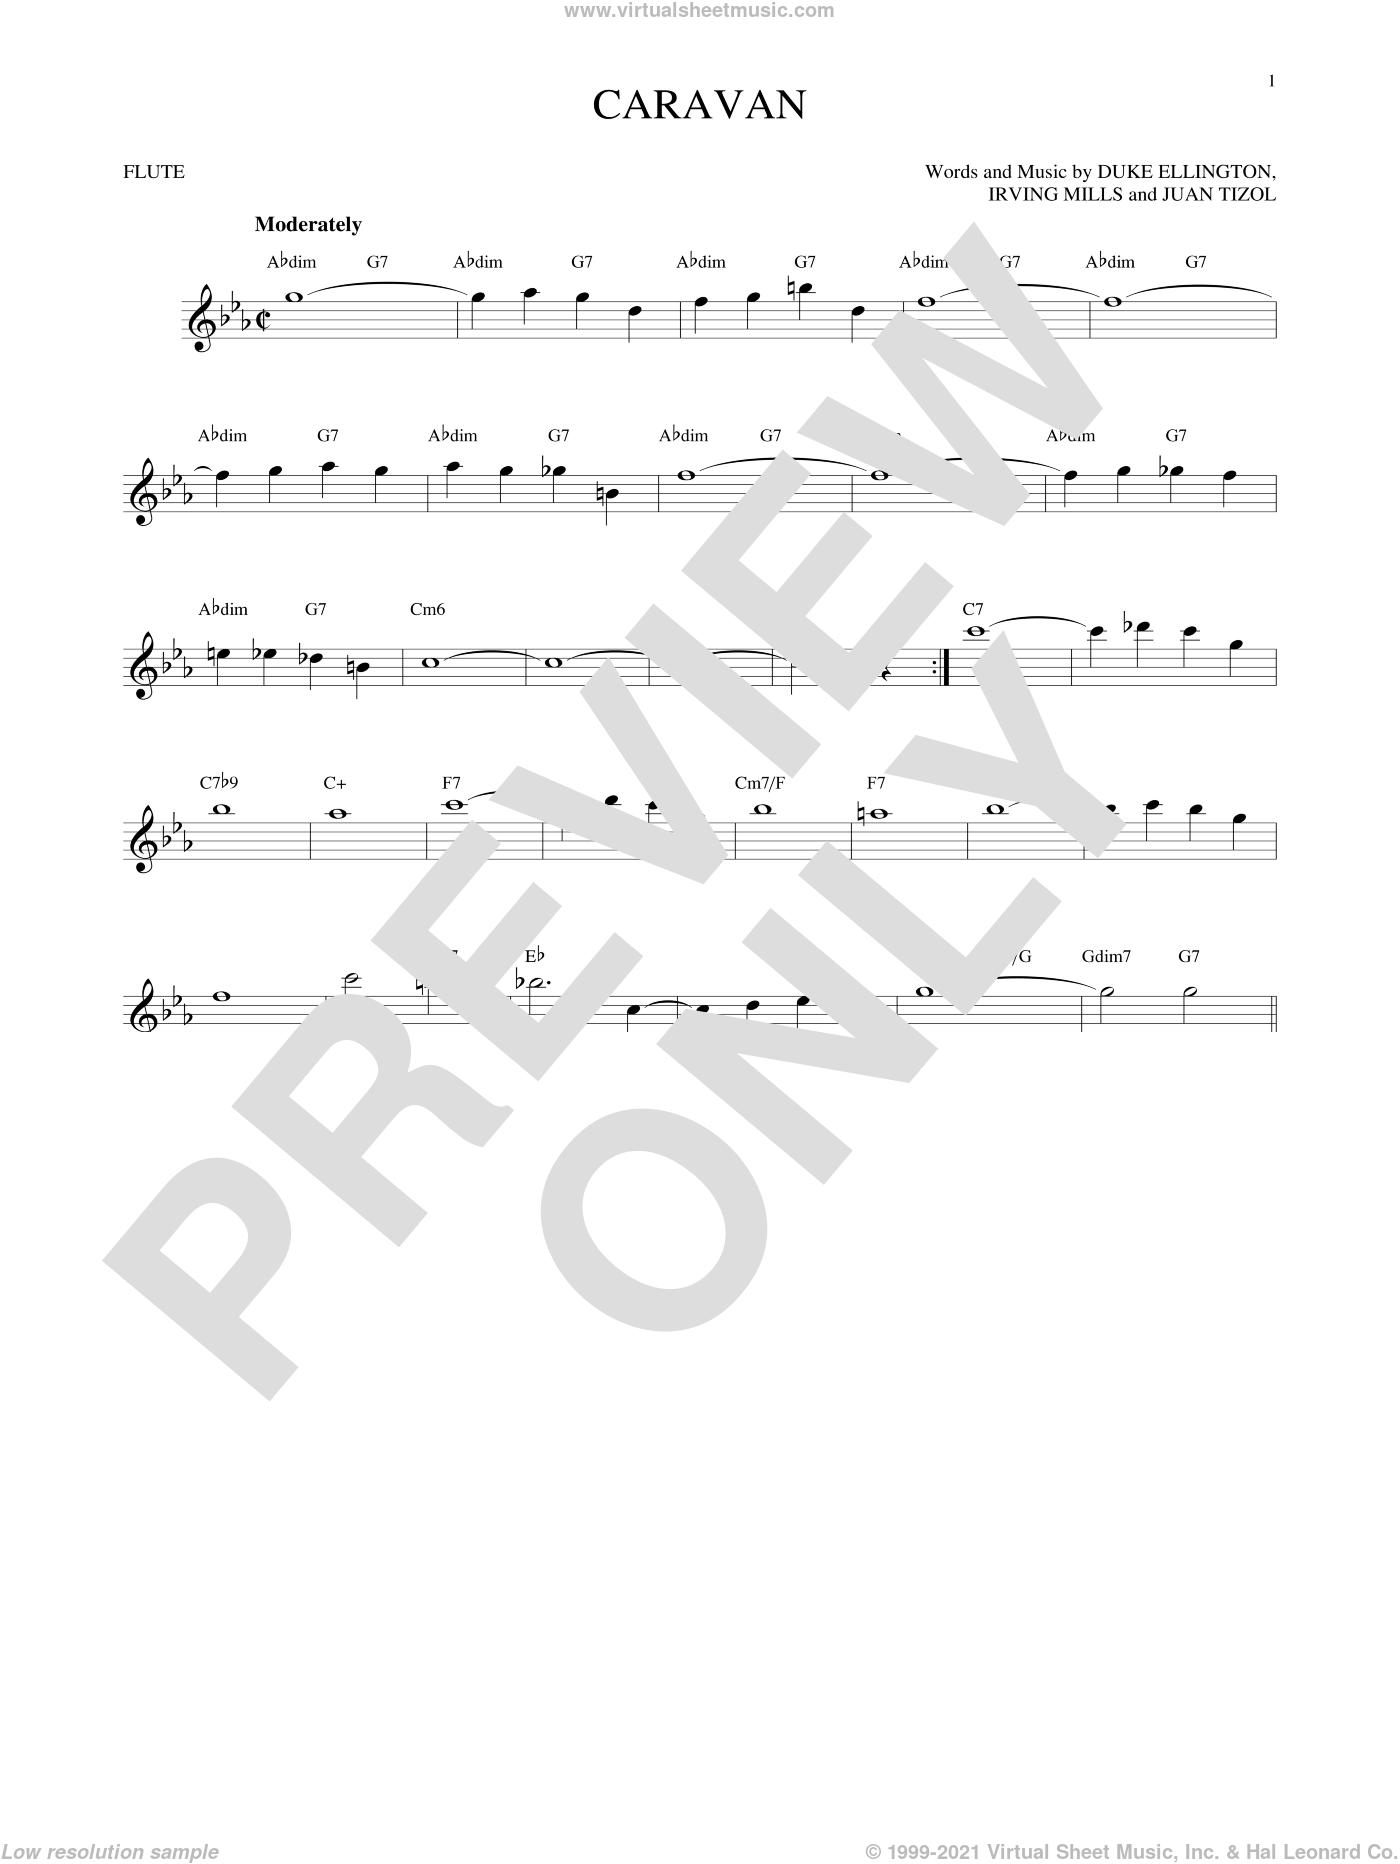 Caravan sheet music for flute solo by Duke Ellington, Billy Eckstine, Duke Ellington and his Orchestra, Ralph Marterie, Irving Mills, Juan Tizol and Juan Tizol & Duke Ellington, intermediate skill level